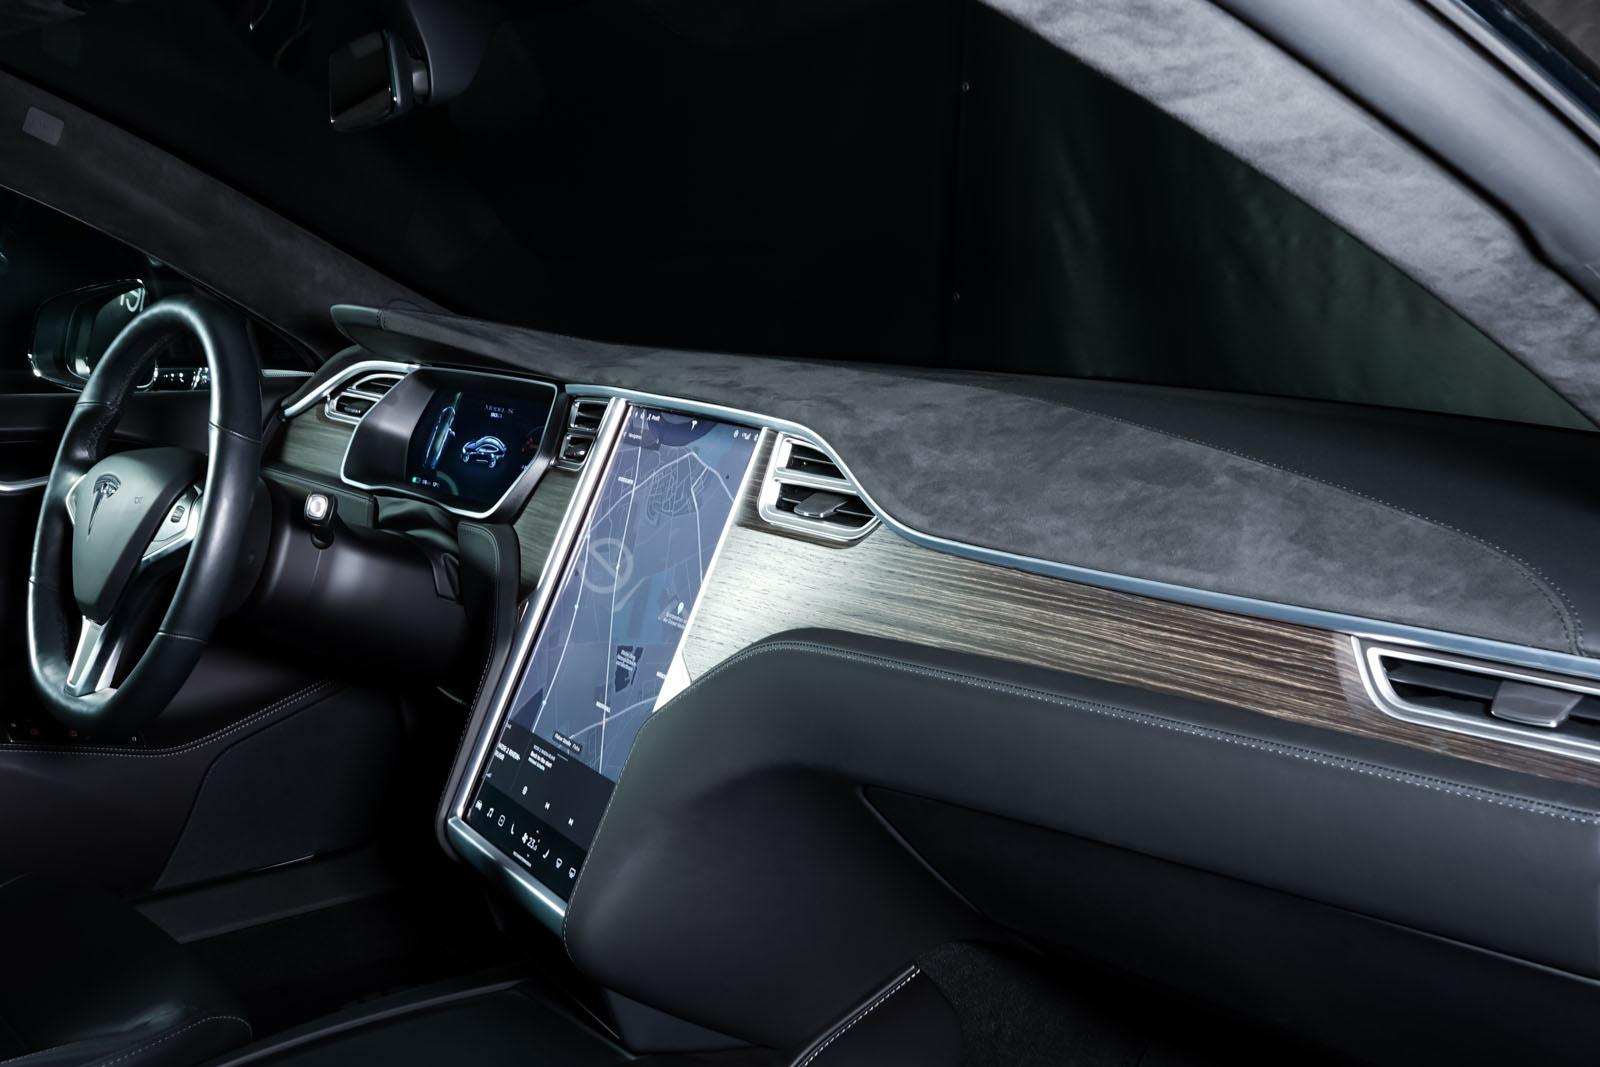 Tesla_ModelS_Schwarz_Schwarz_TES-6166_19_w